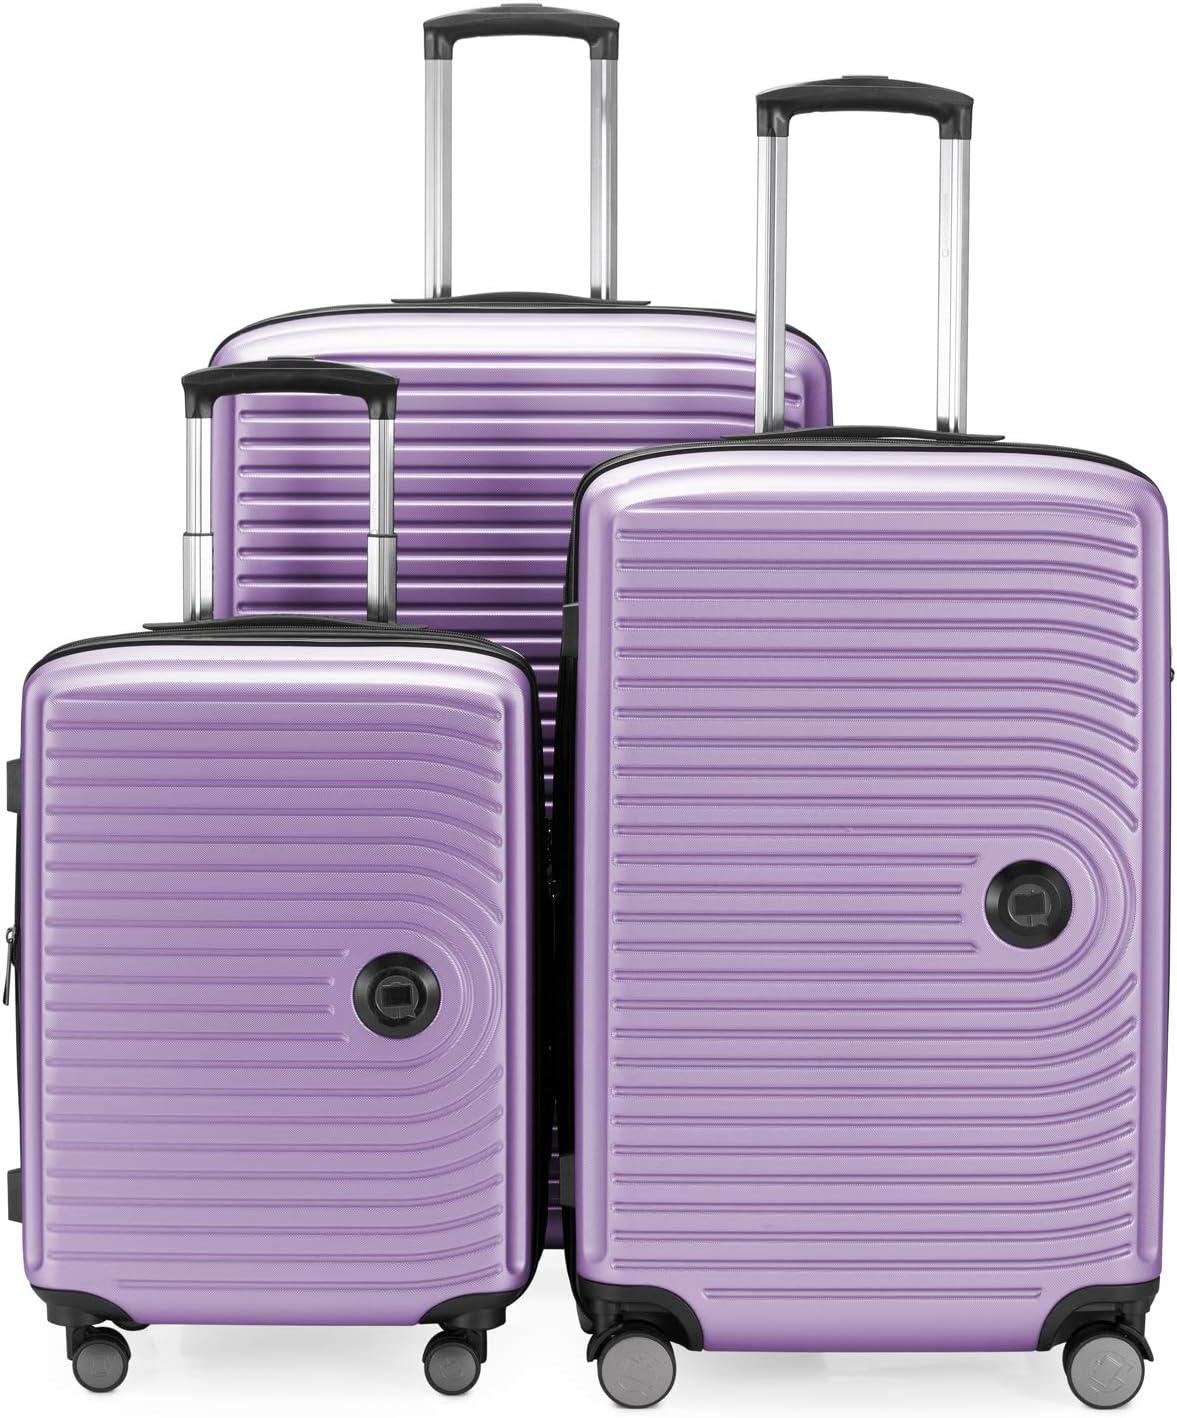 HAUPTSTADTKOFFER - Juego de 3 maletas extensibles – Trolley cabina de de 55 cm, Equipaje de tamaño mediano 68 cm + maleta grande para viaje 77 cm, cáscara dura ABS, TSA, Lila